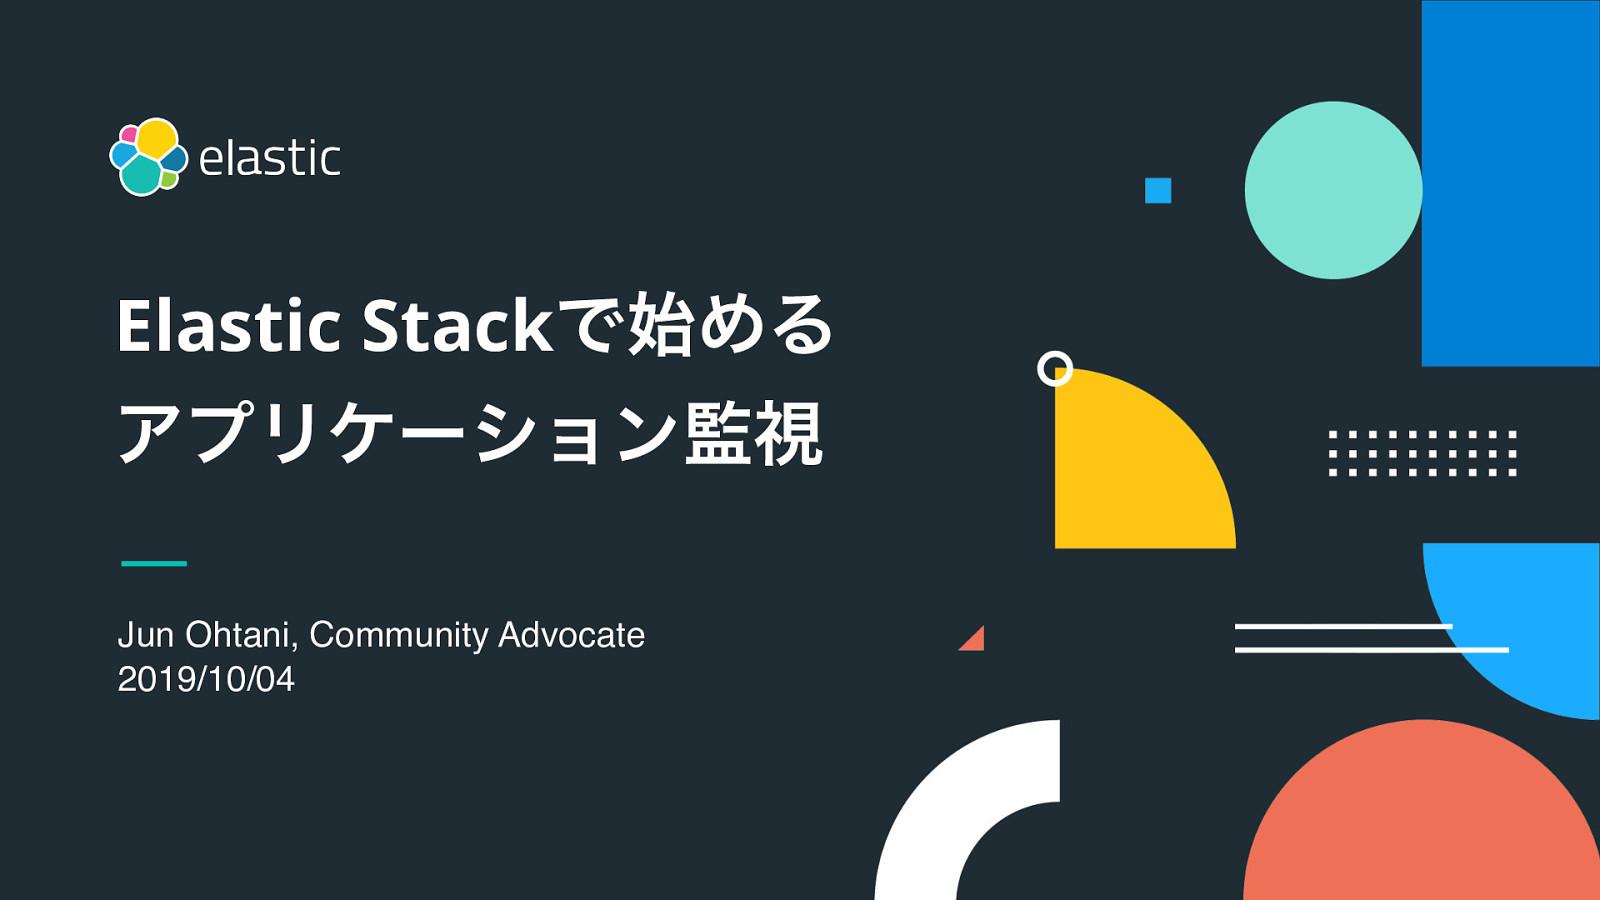 Elastic Stackで始めるアプリケーション監視